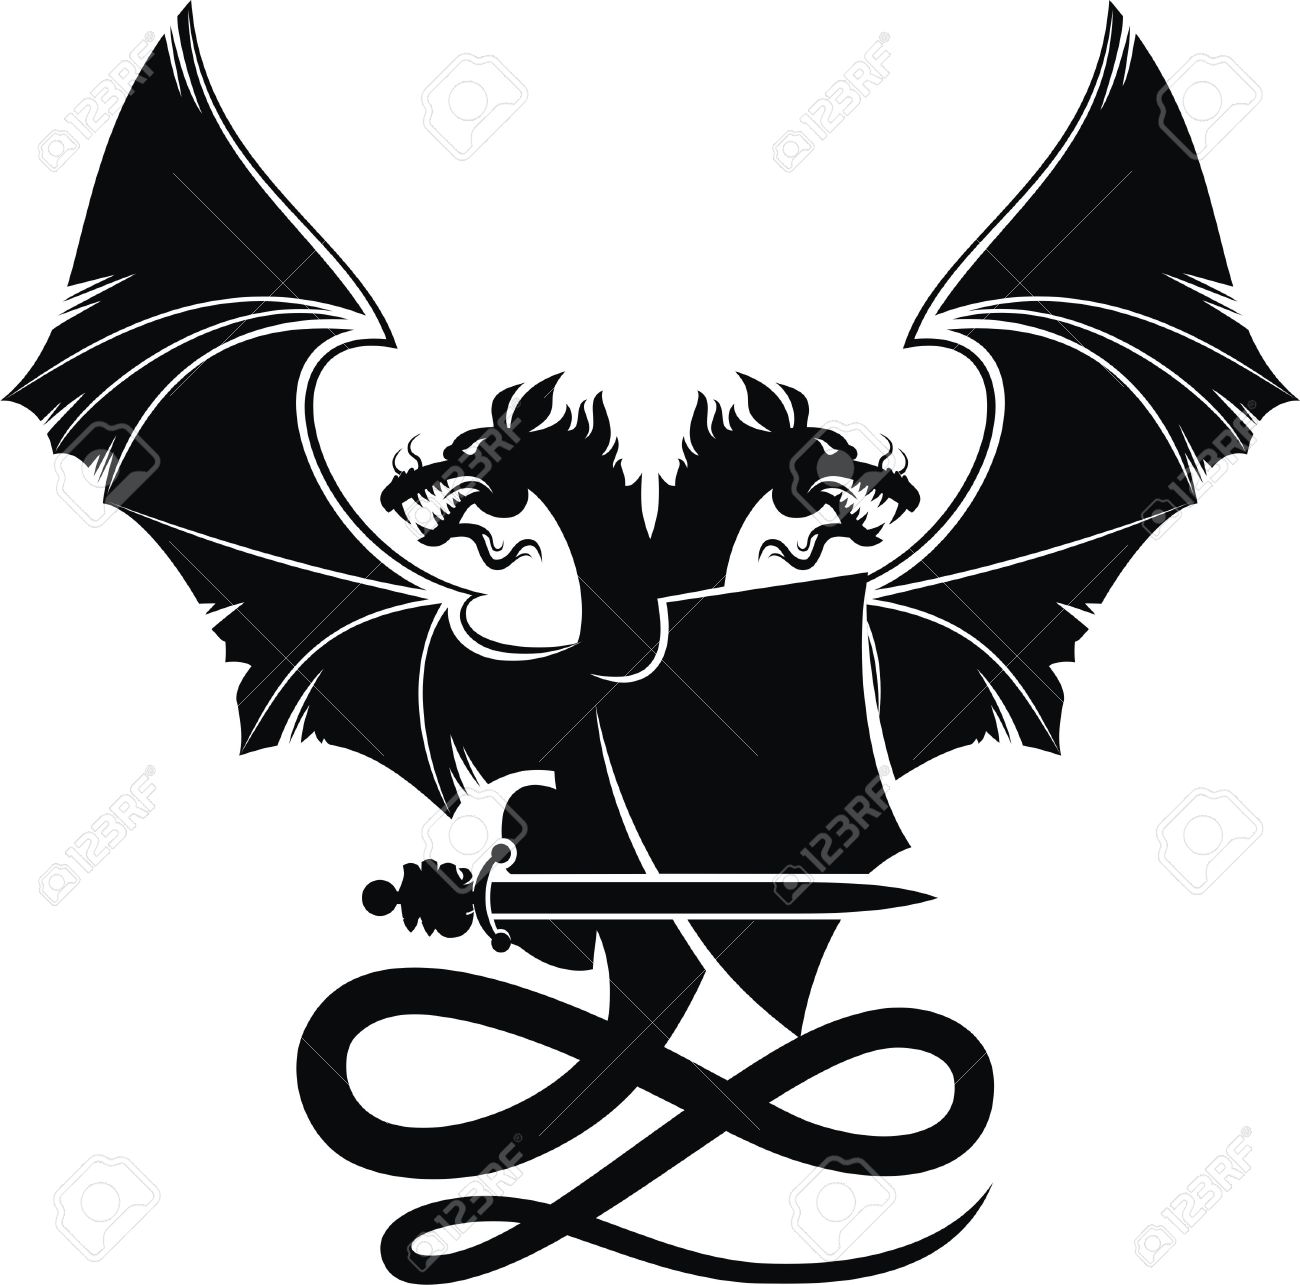 How to breed heraldic dragon - Heraldic Composition Heraldic Composition With Dragon Badge And Sword